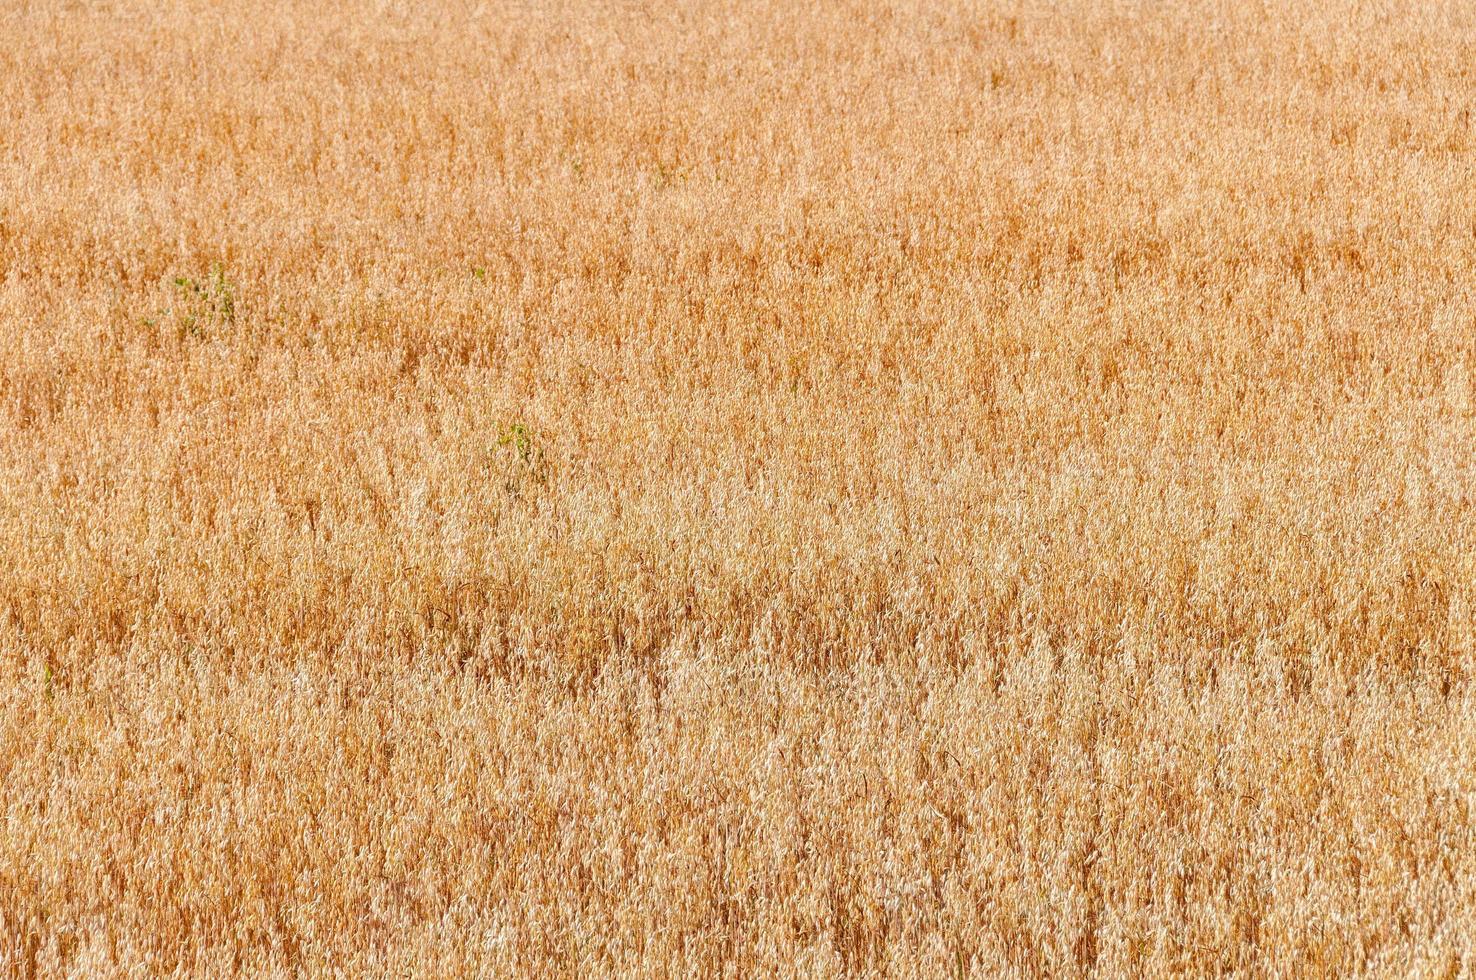 goldene reife Haferohren auf dem Feld der Ernte bereit foto